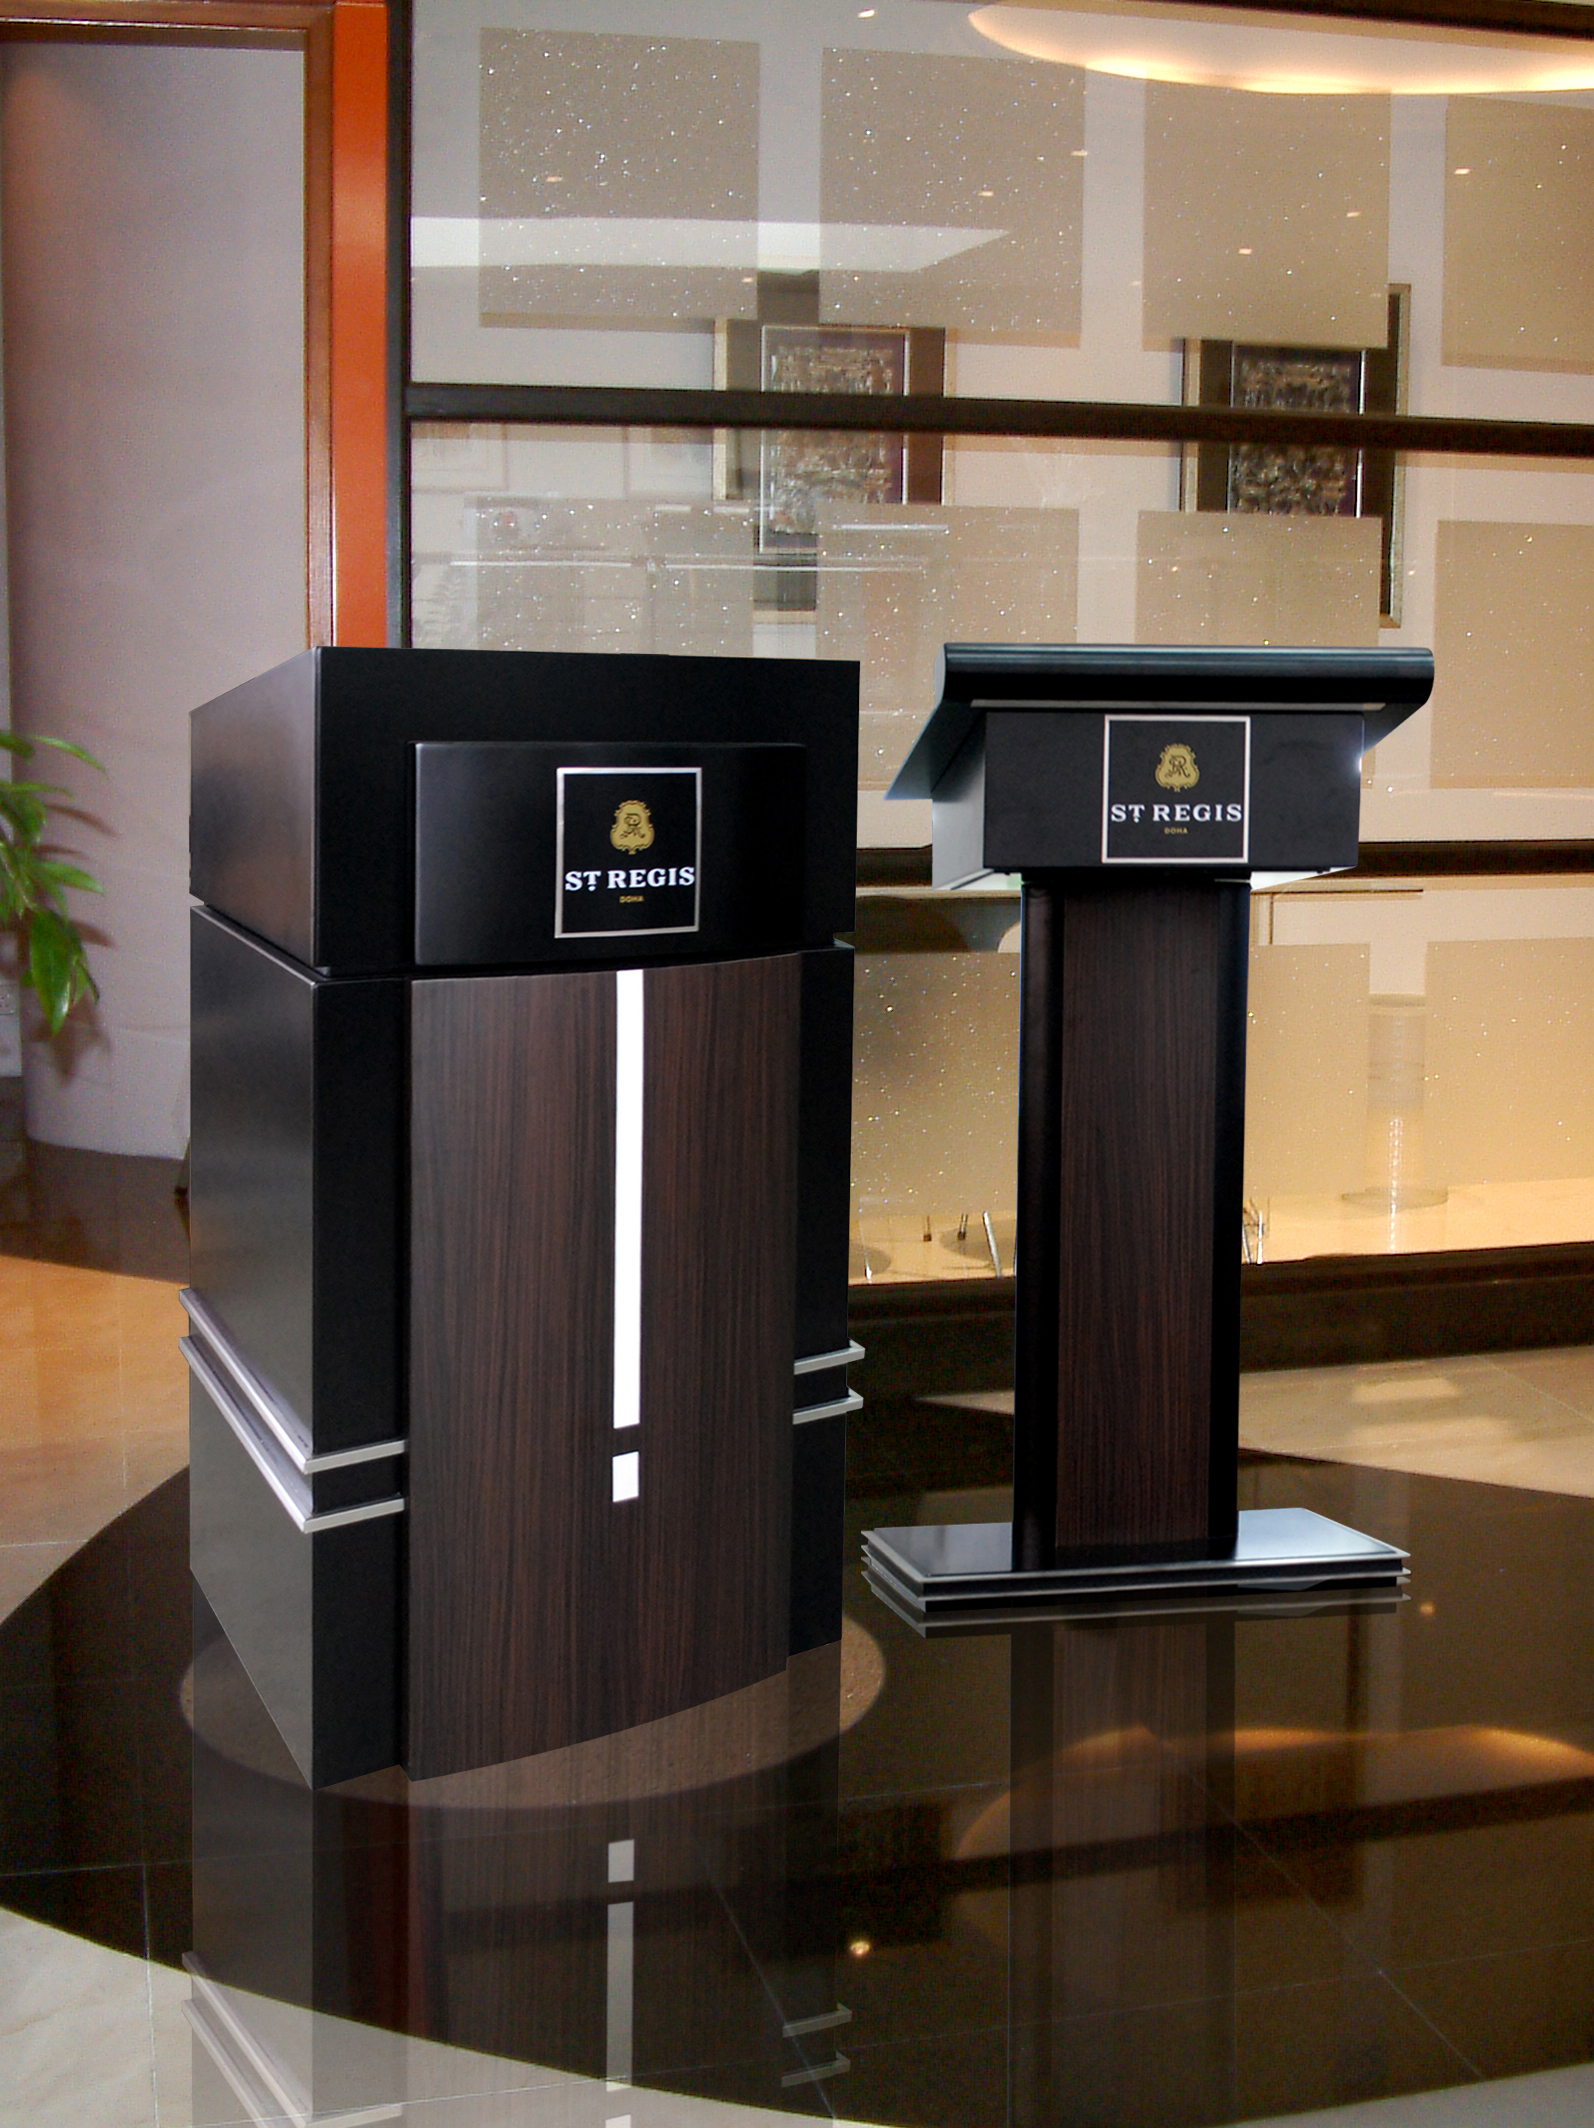 St Regis Hotel, Qatar